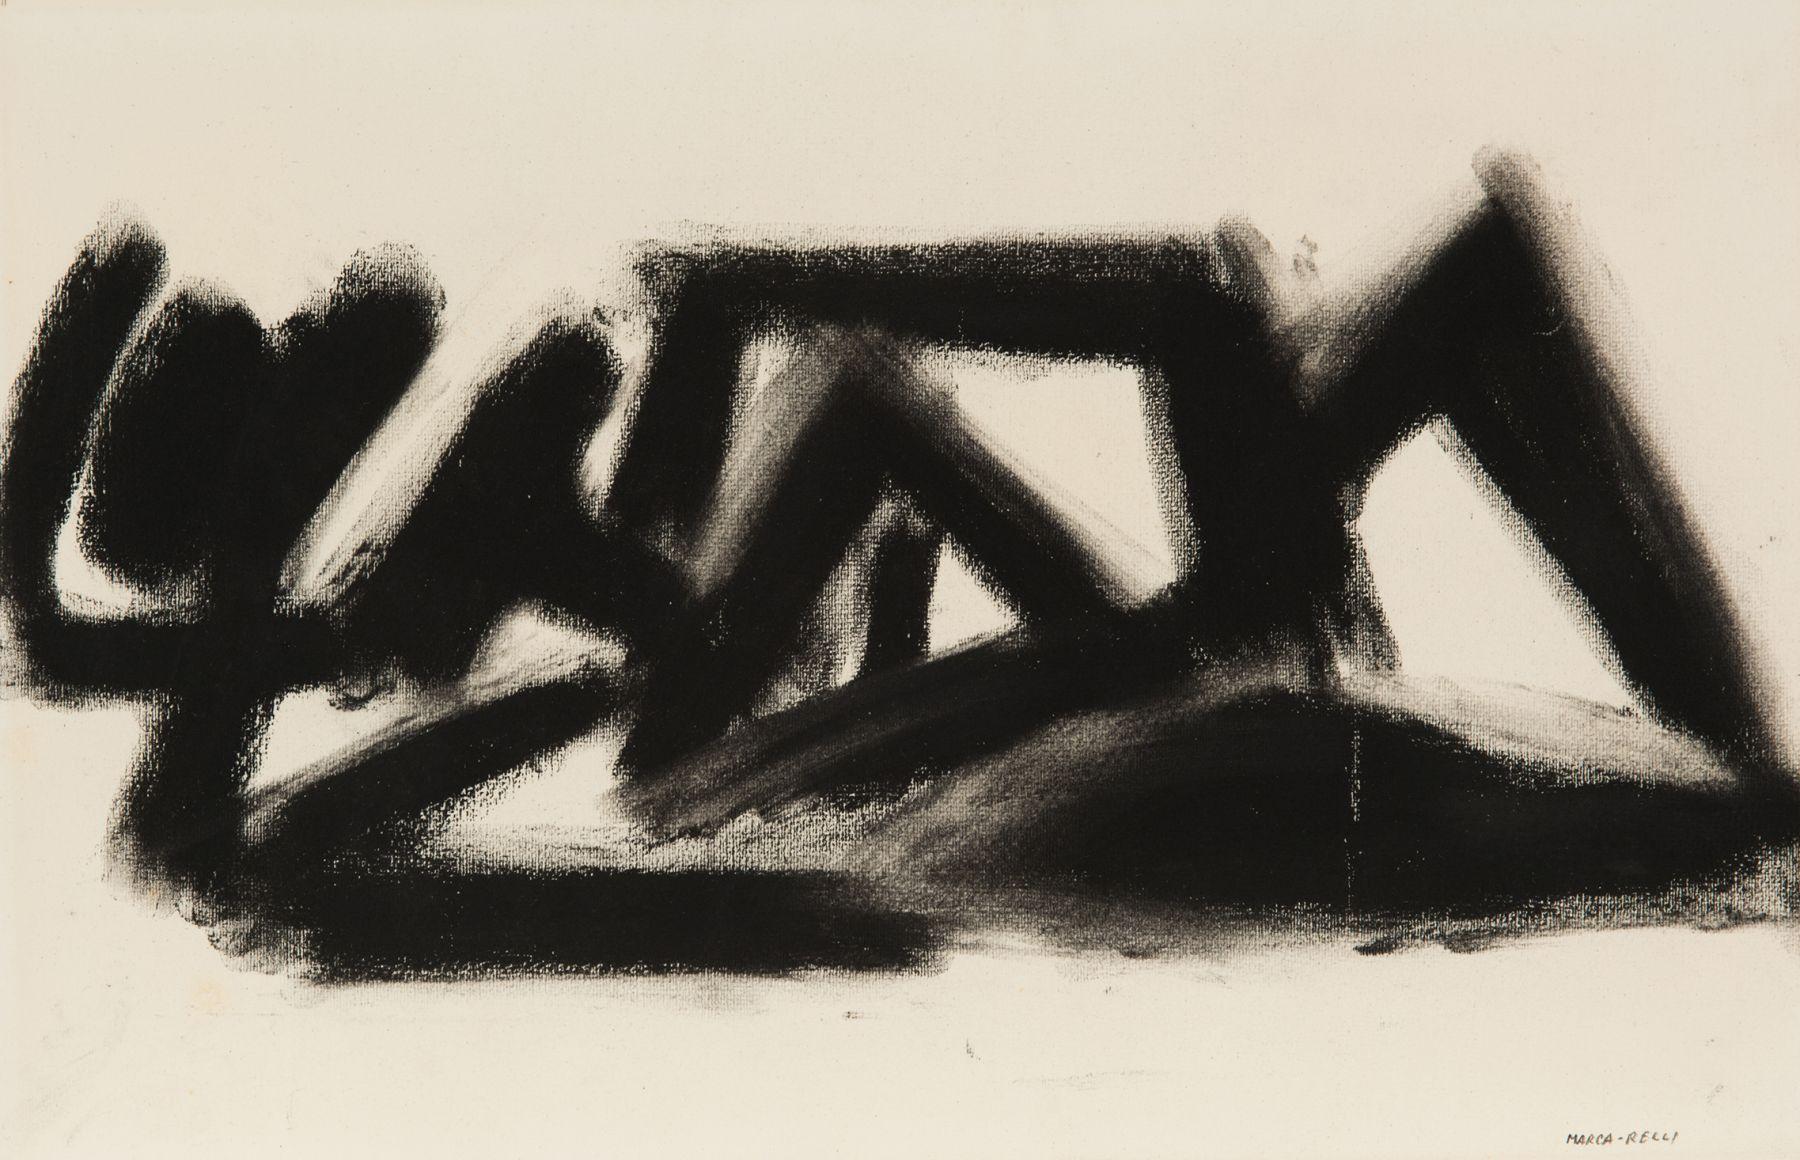 Conrad Marca-Relli (1913-2000) D-3-66, 1966